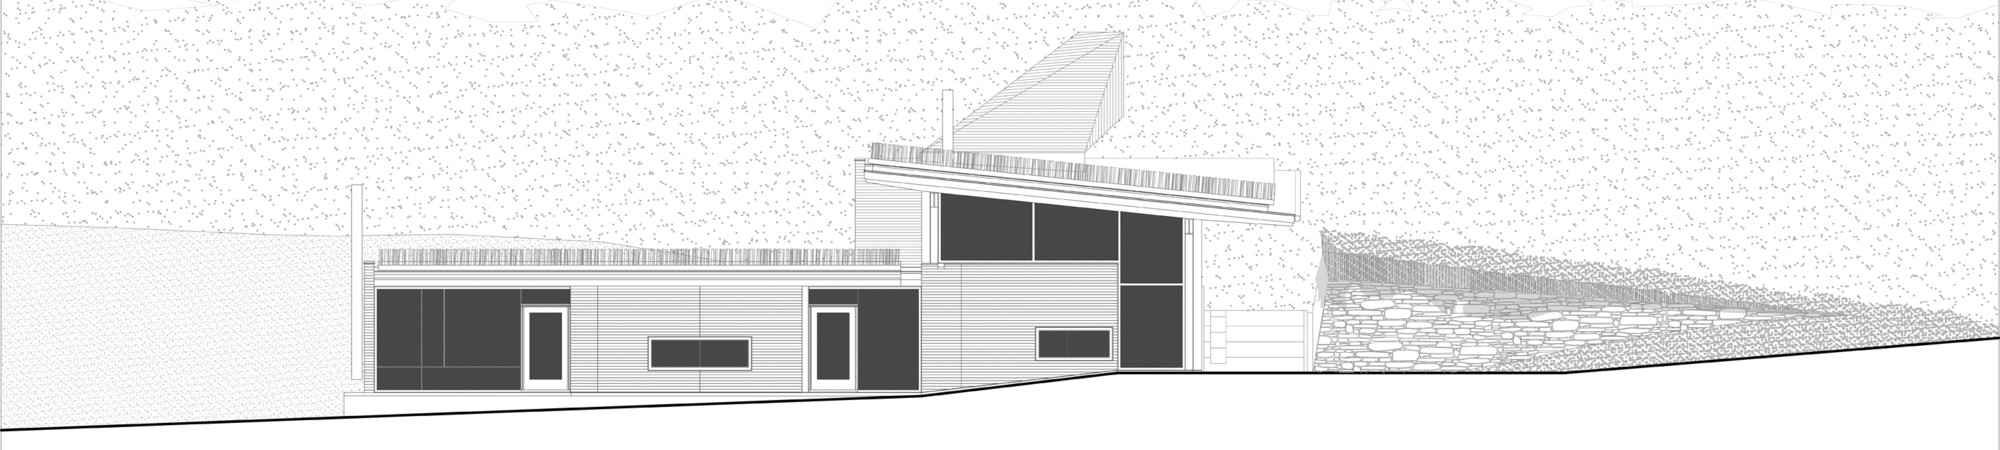 Meadow House / Ian MacDonald Architect